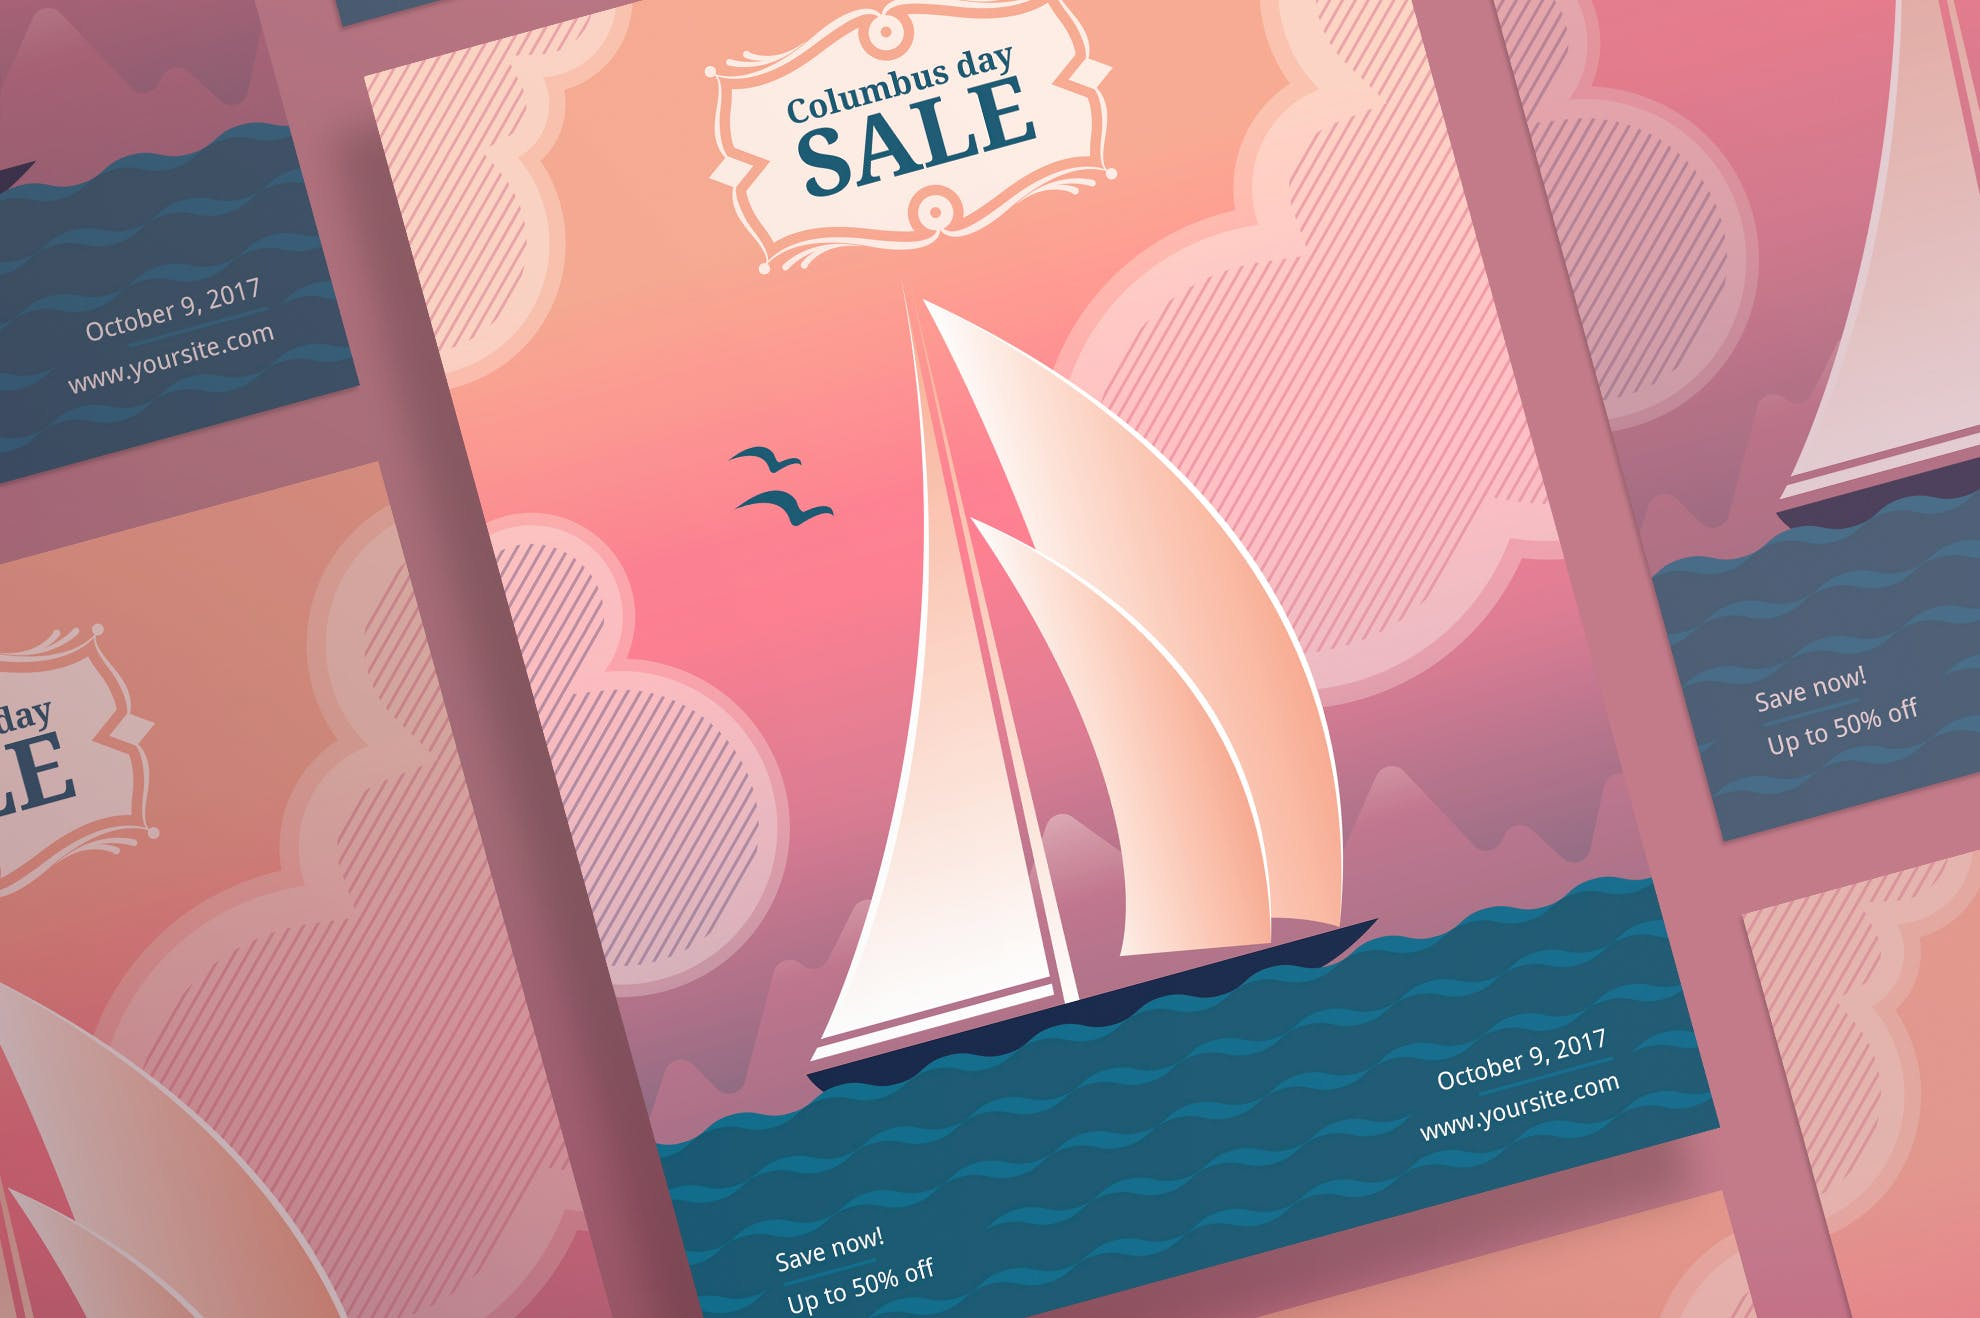 哥伦布日销售传单和海报模板Columbus Day Sale Flyer and Poster Template